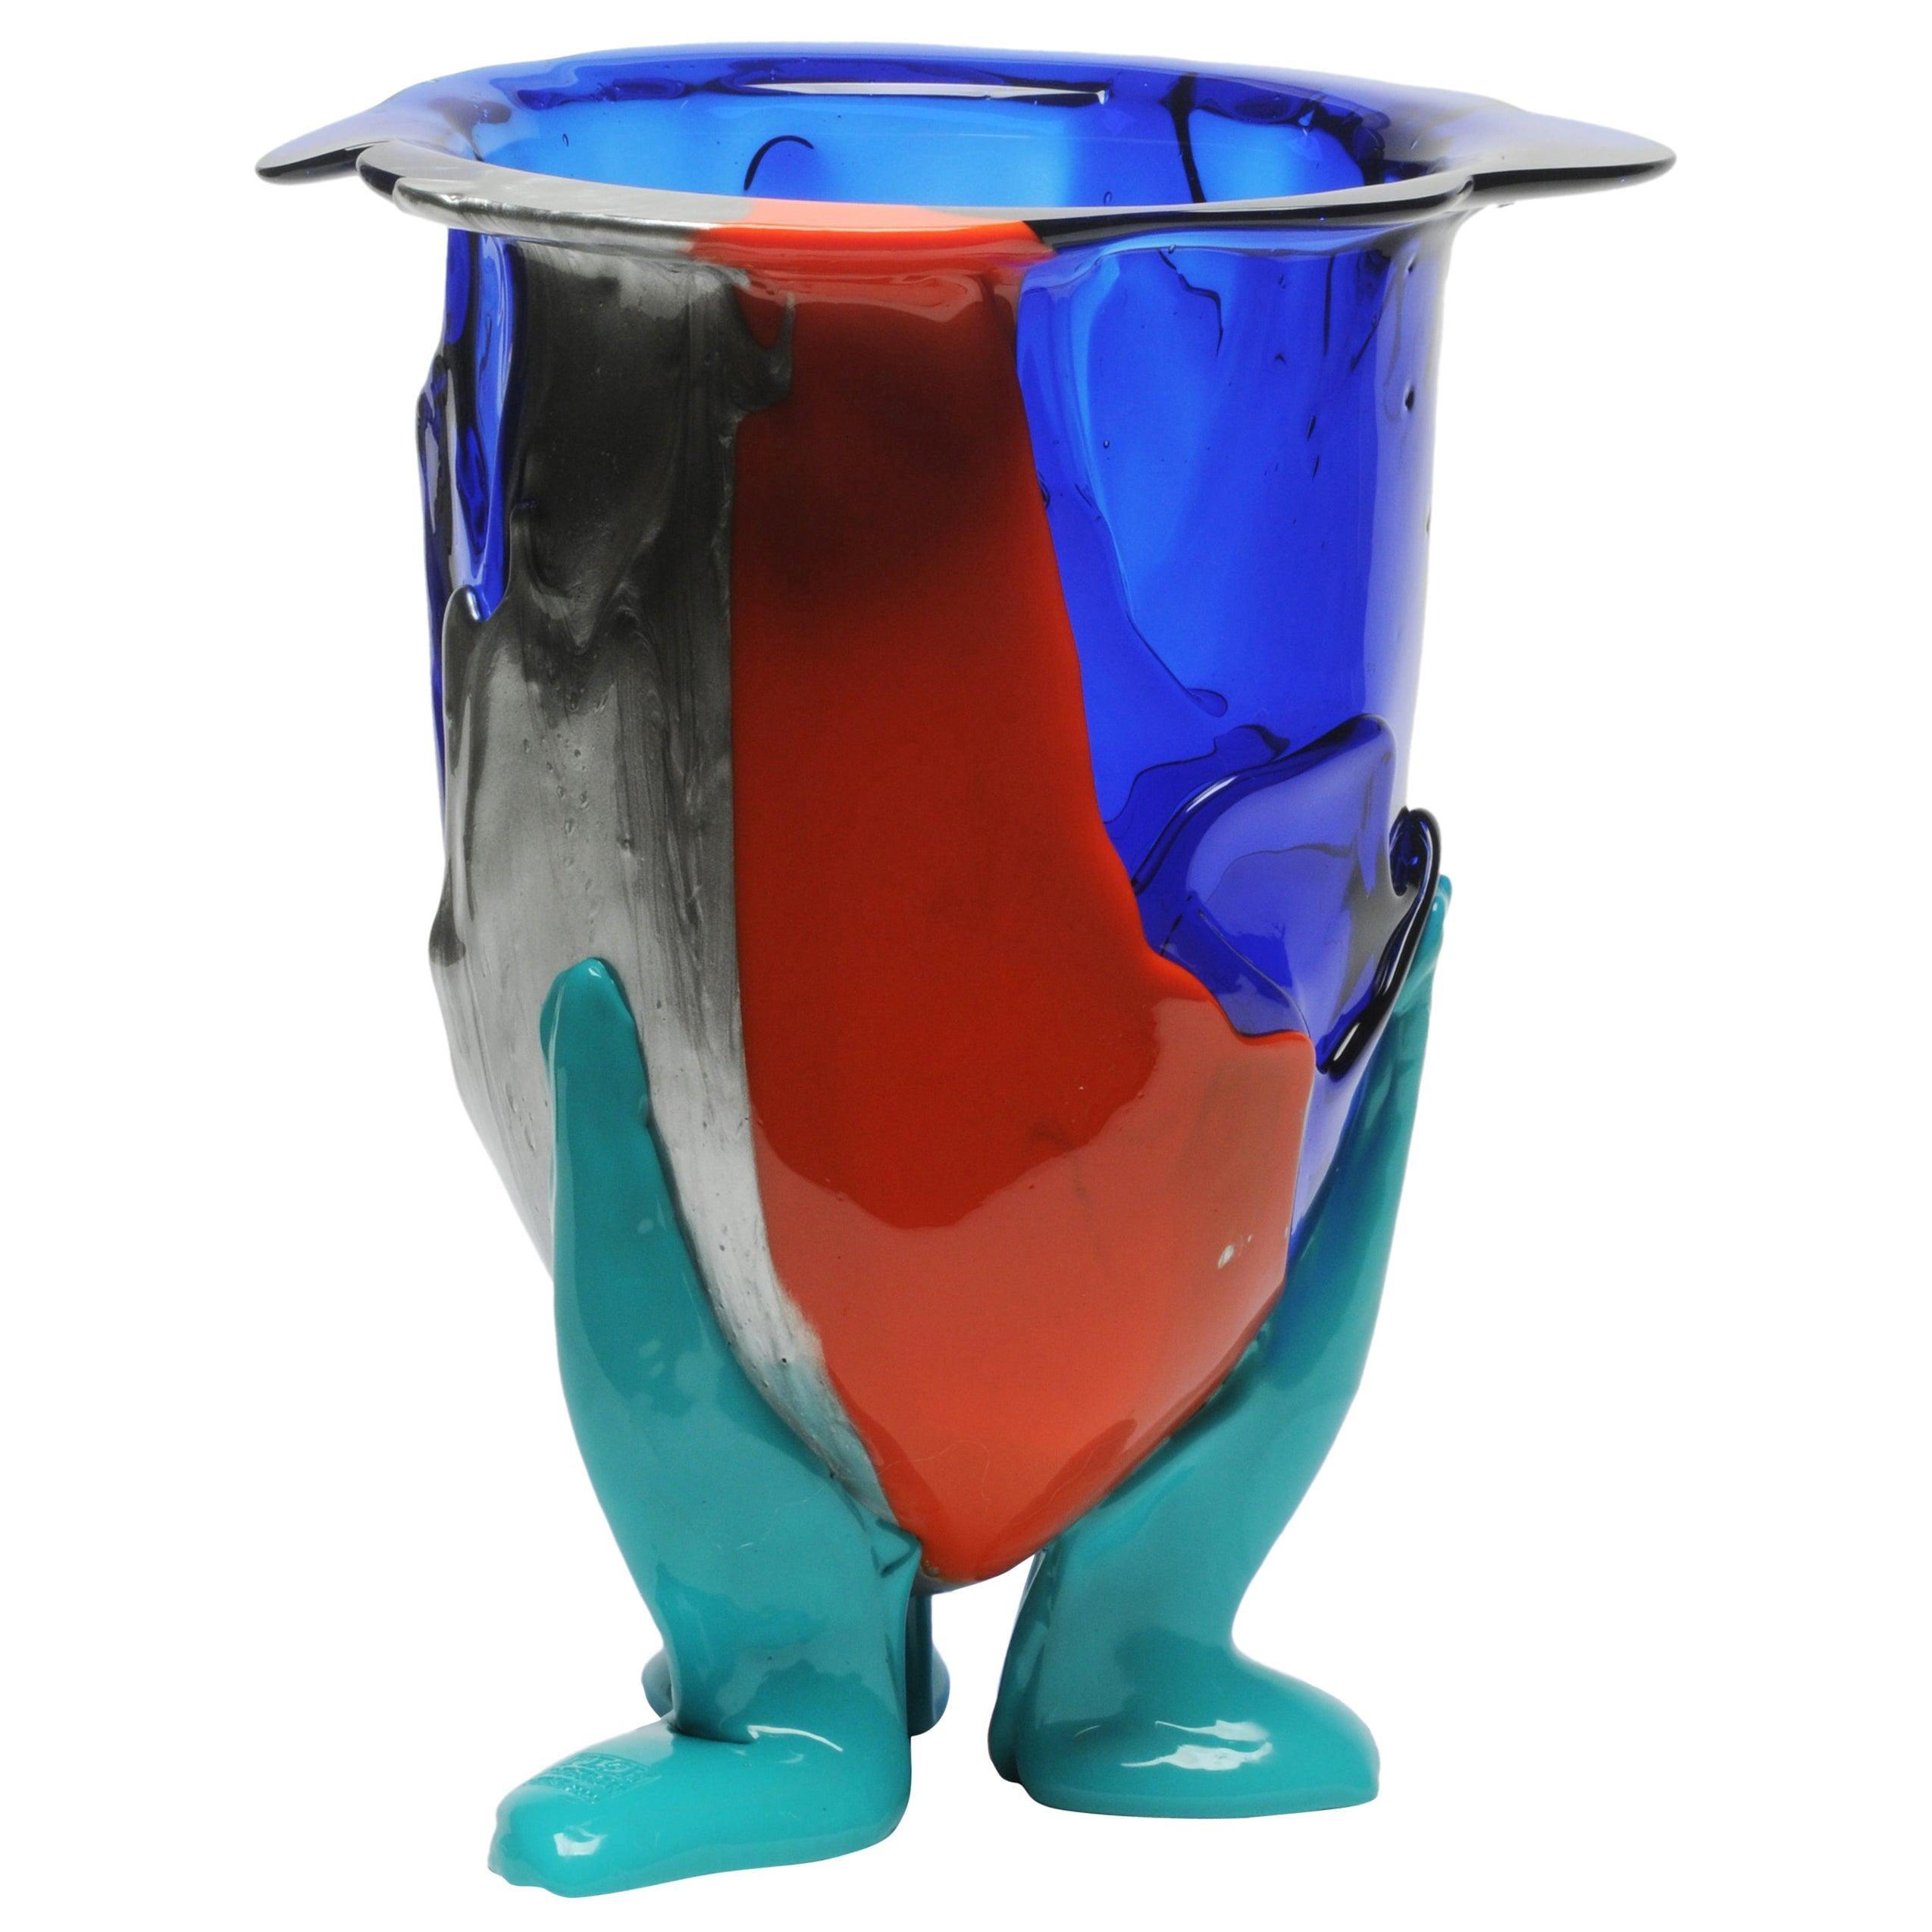 21st Century Gaetano Pesce Amazonia M Vase Soft Resin Blue Red Turquoise Silver